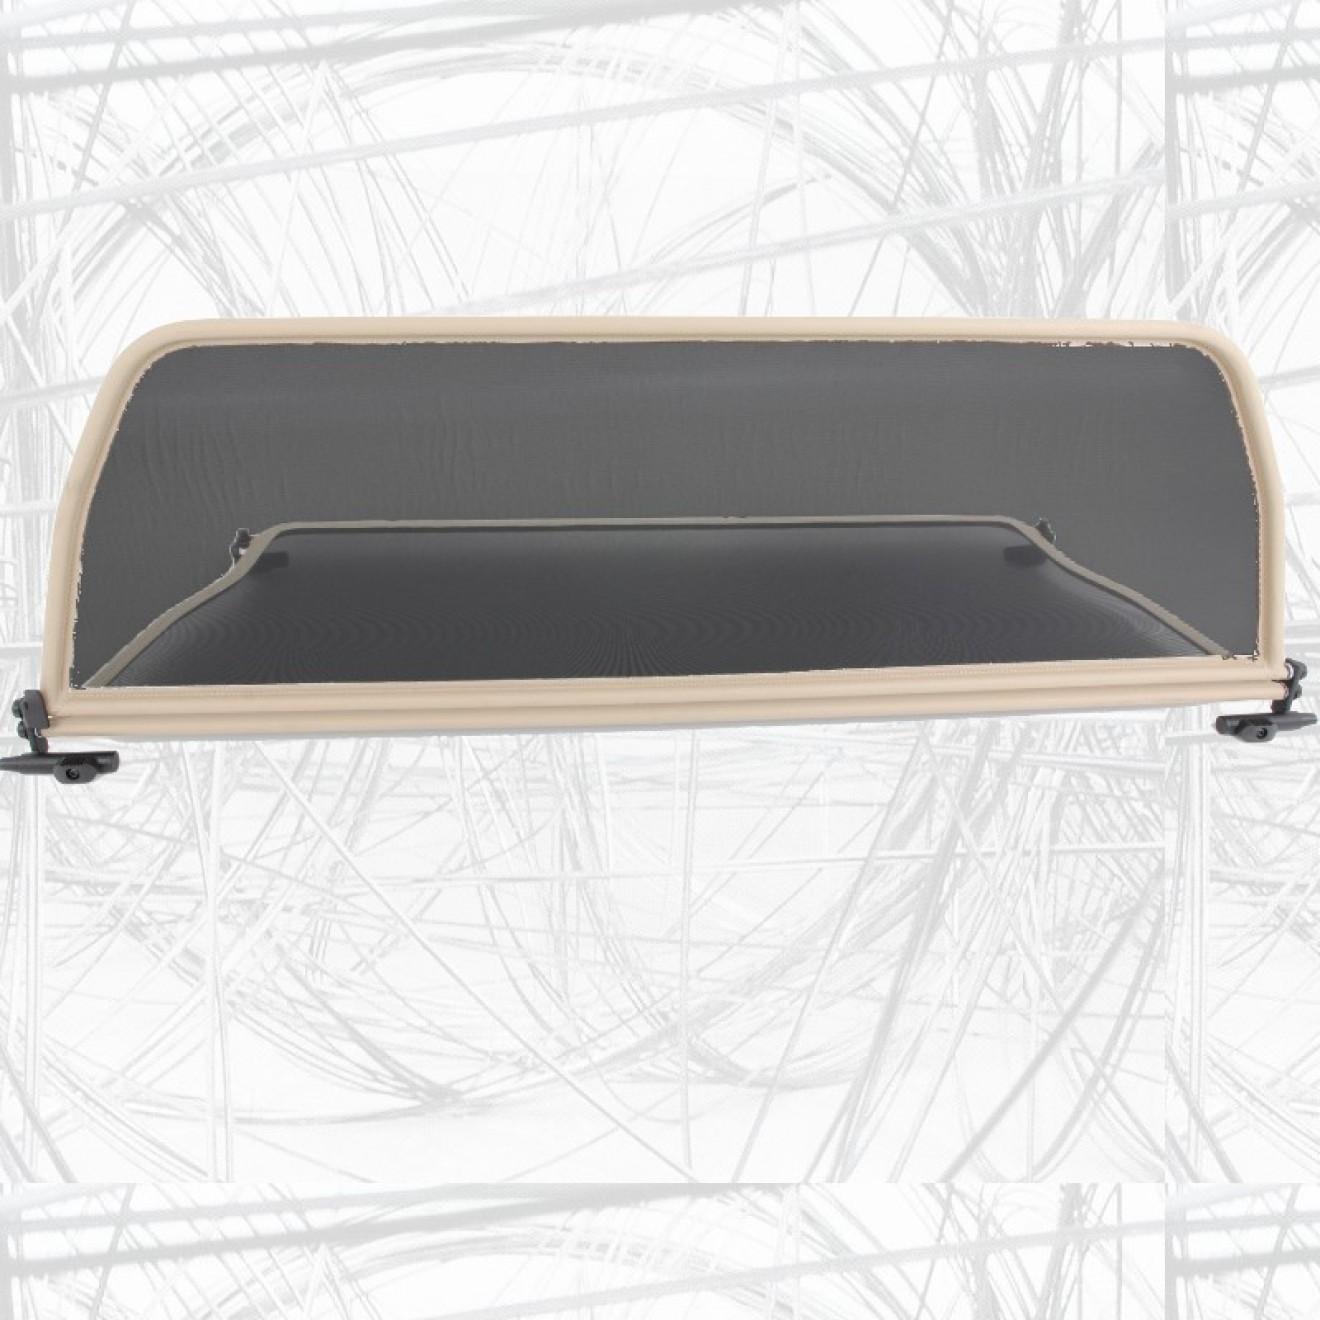 netz windschott f r vw beetle cabrio 5c. Black Bedroom Furniture Sets. Home Design Ideas